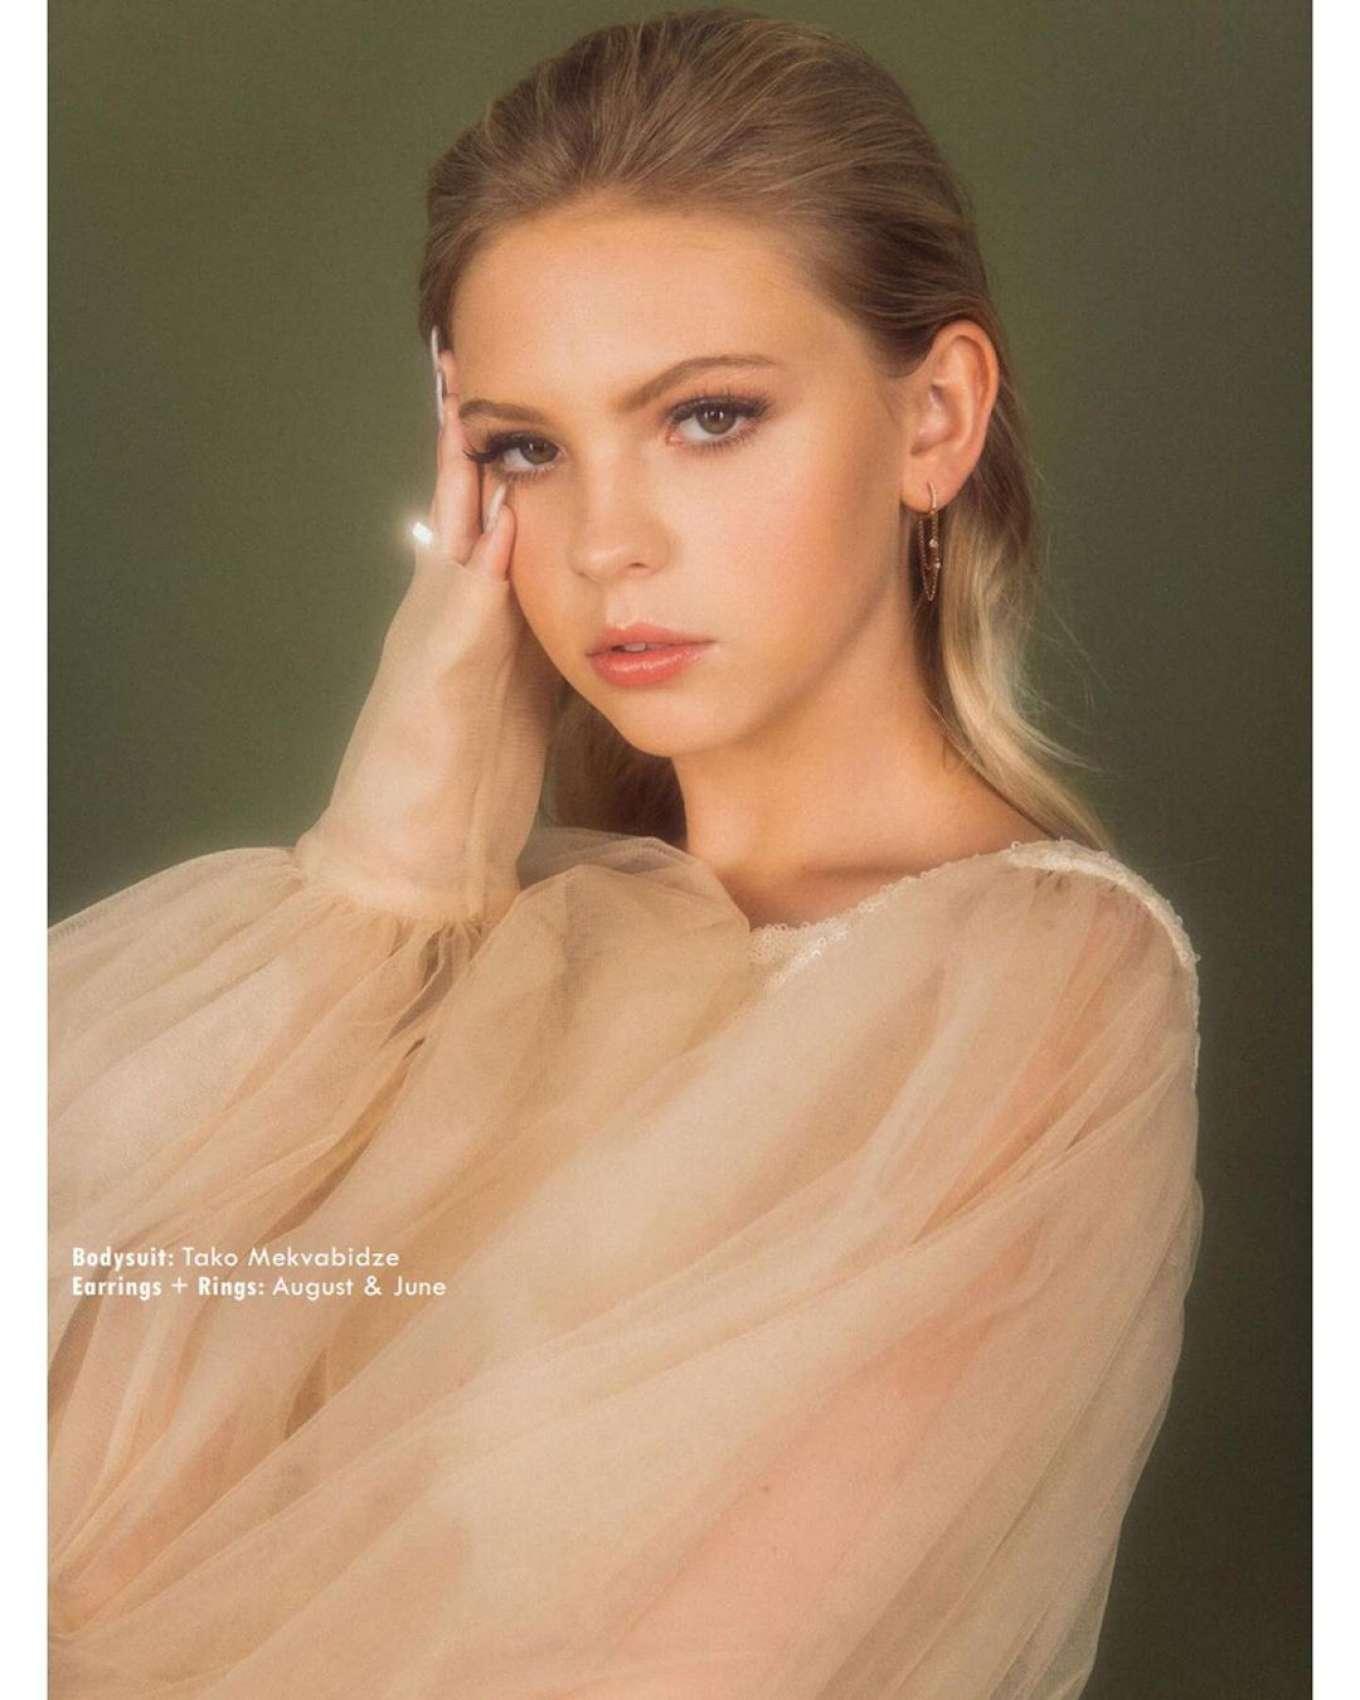 Jordyn Jones 2019 : Jordyn Jones – Avante Magazine 2019 adds-04